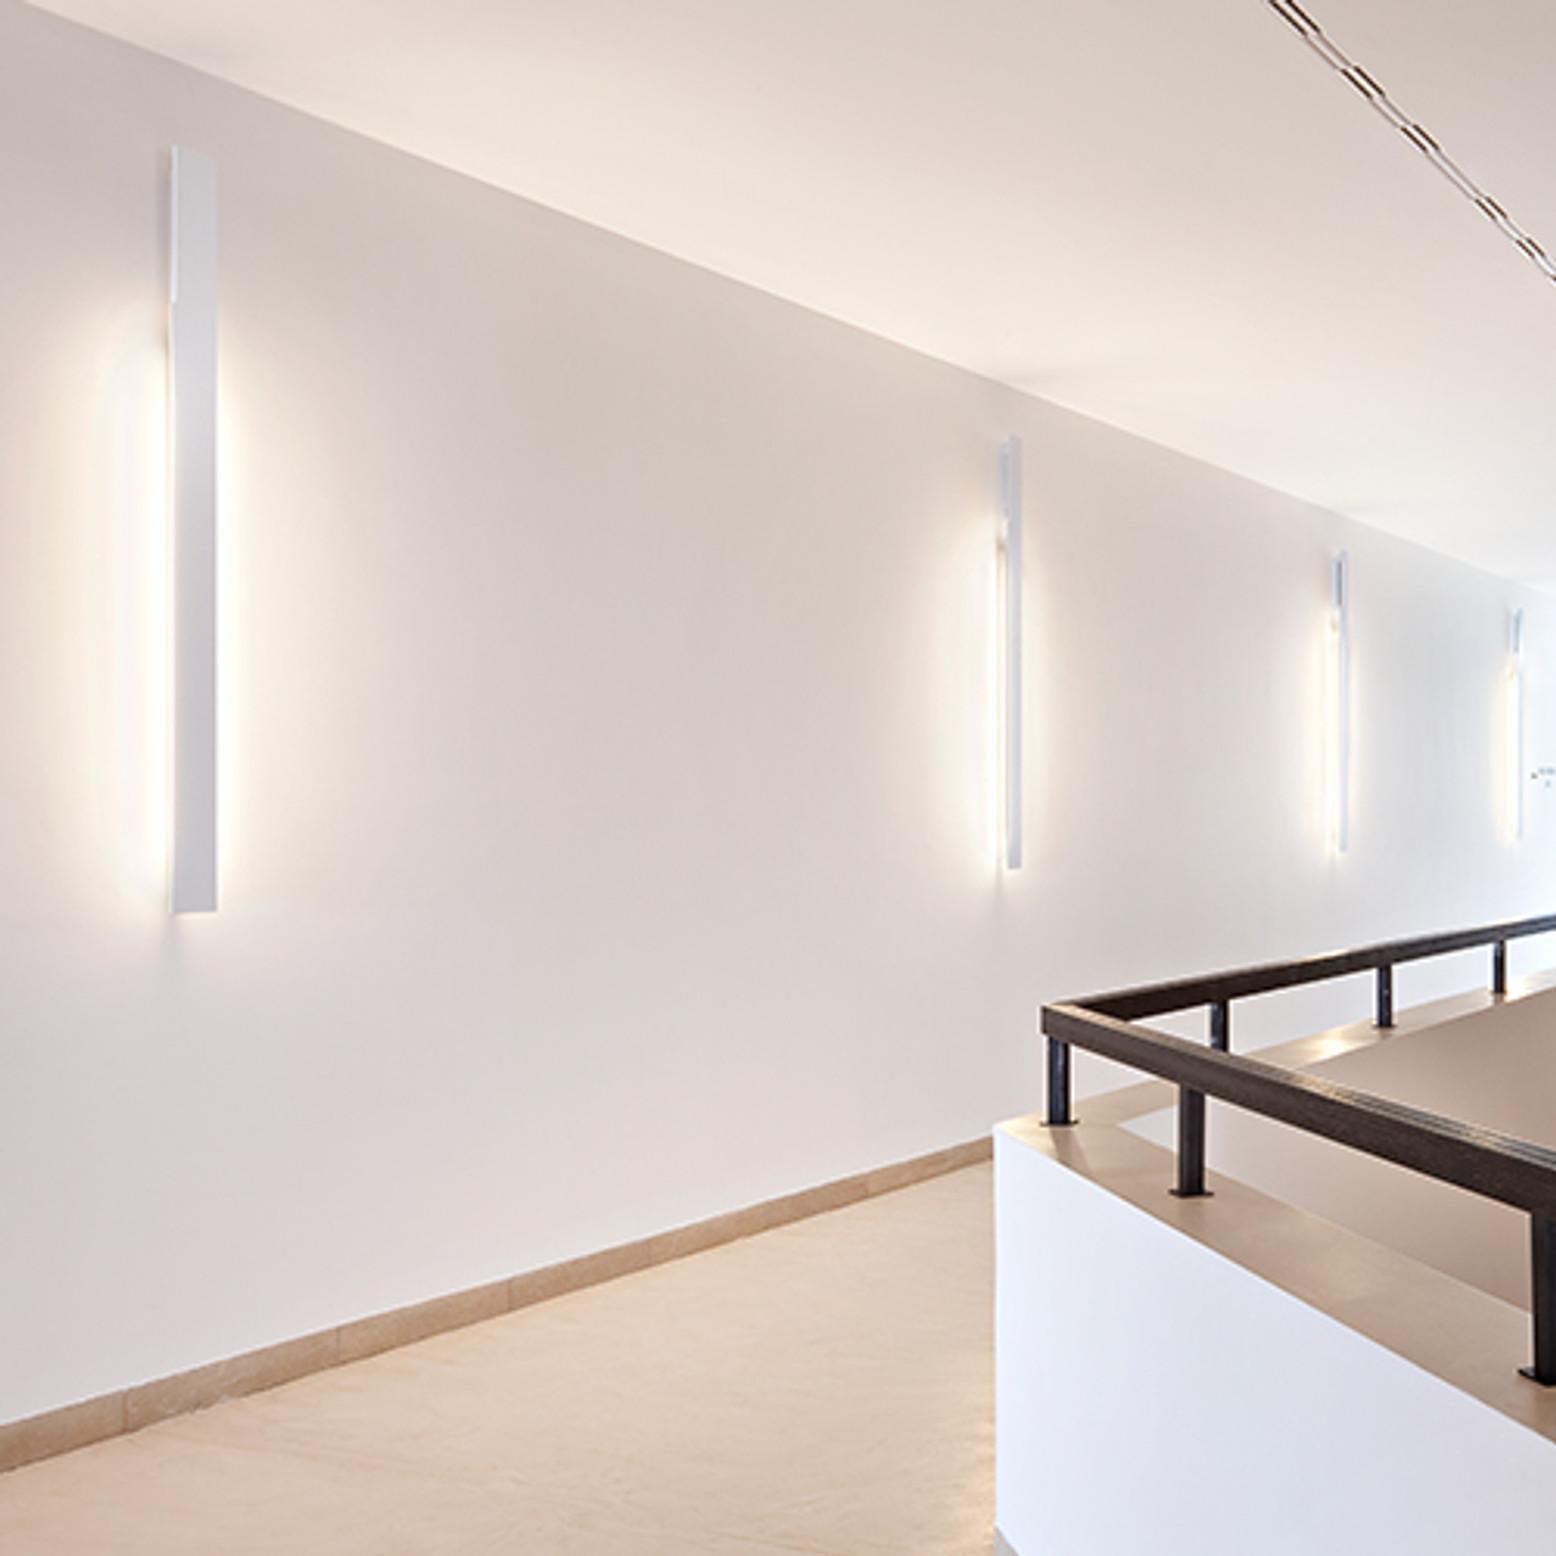 Getting to Know: Lighting Basics